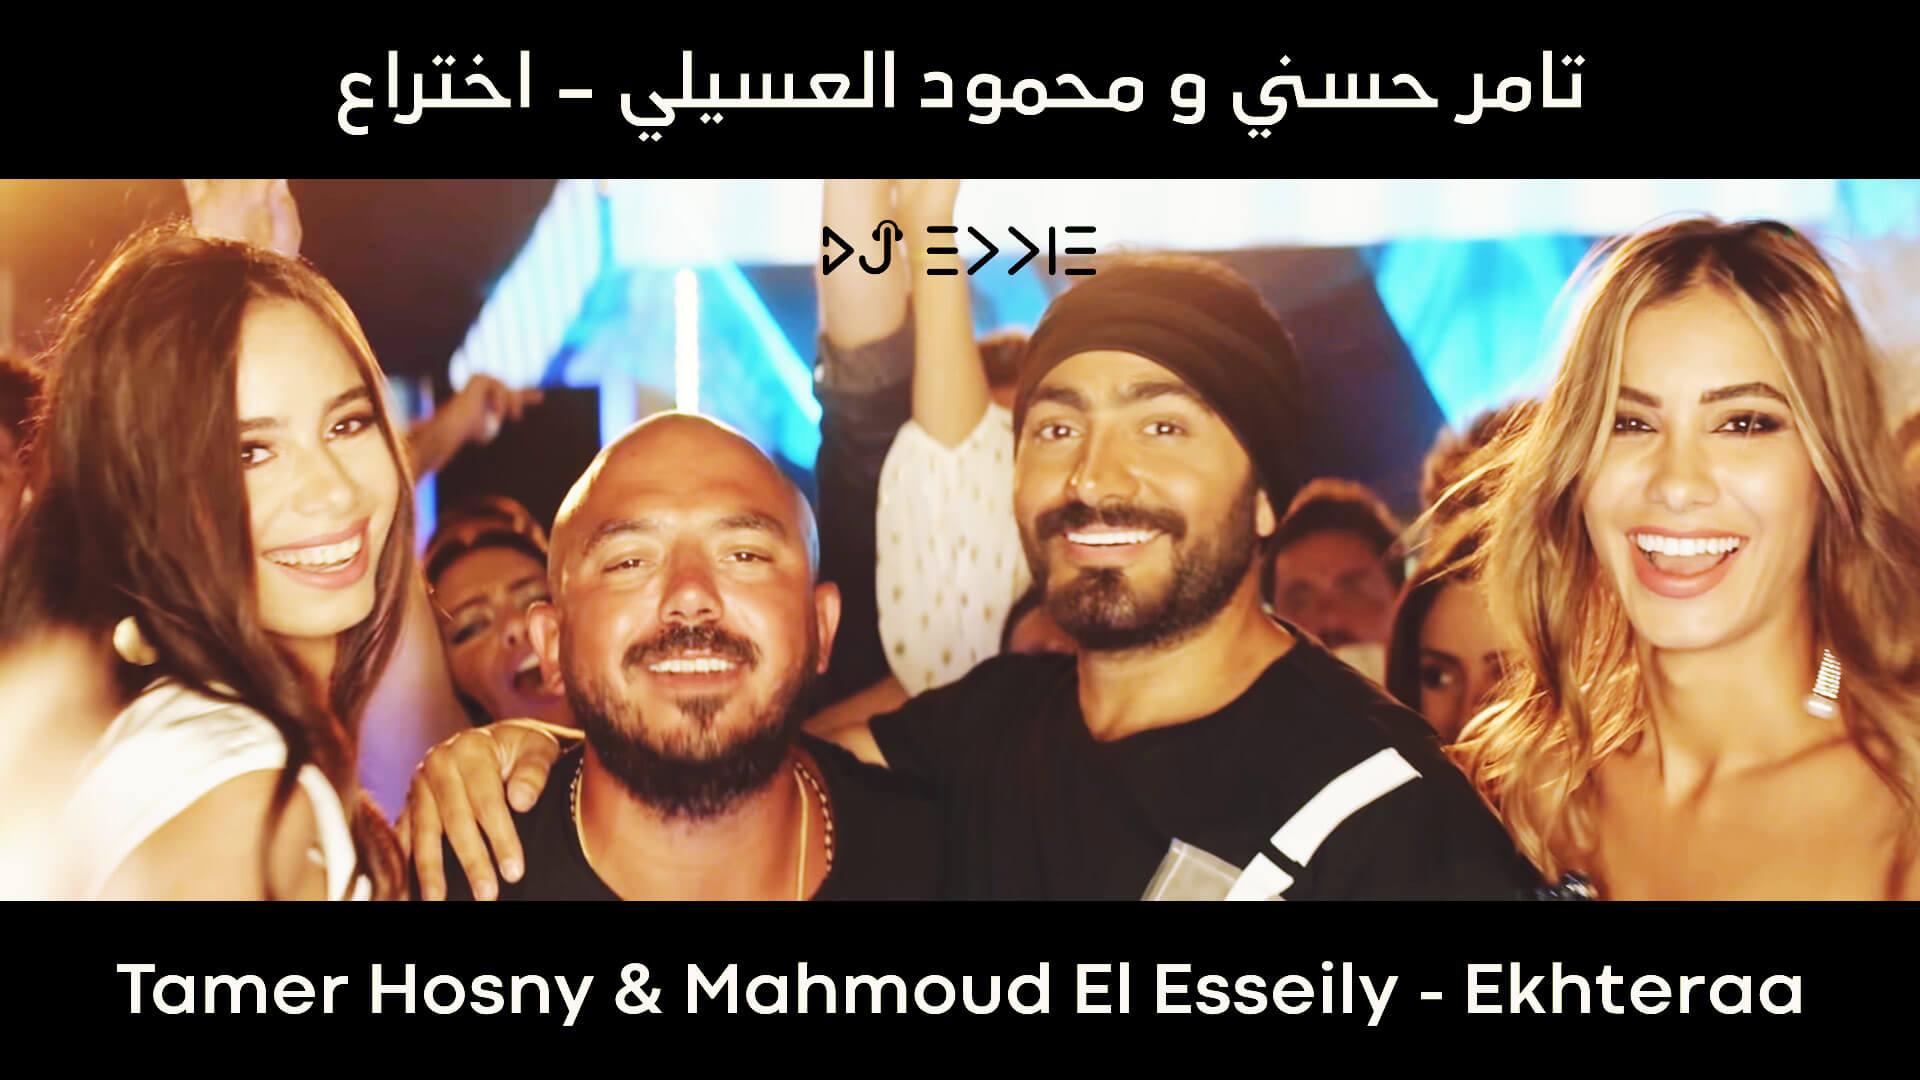 تامر حسني & محمود العسيلي - اختراع Tamer Hosny & Mahmoud El Esseily - Ekhteraa